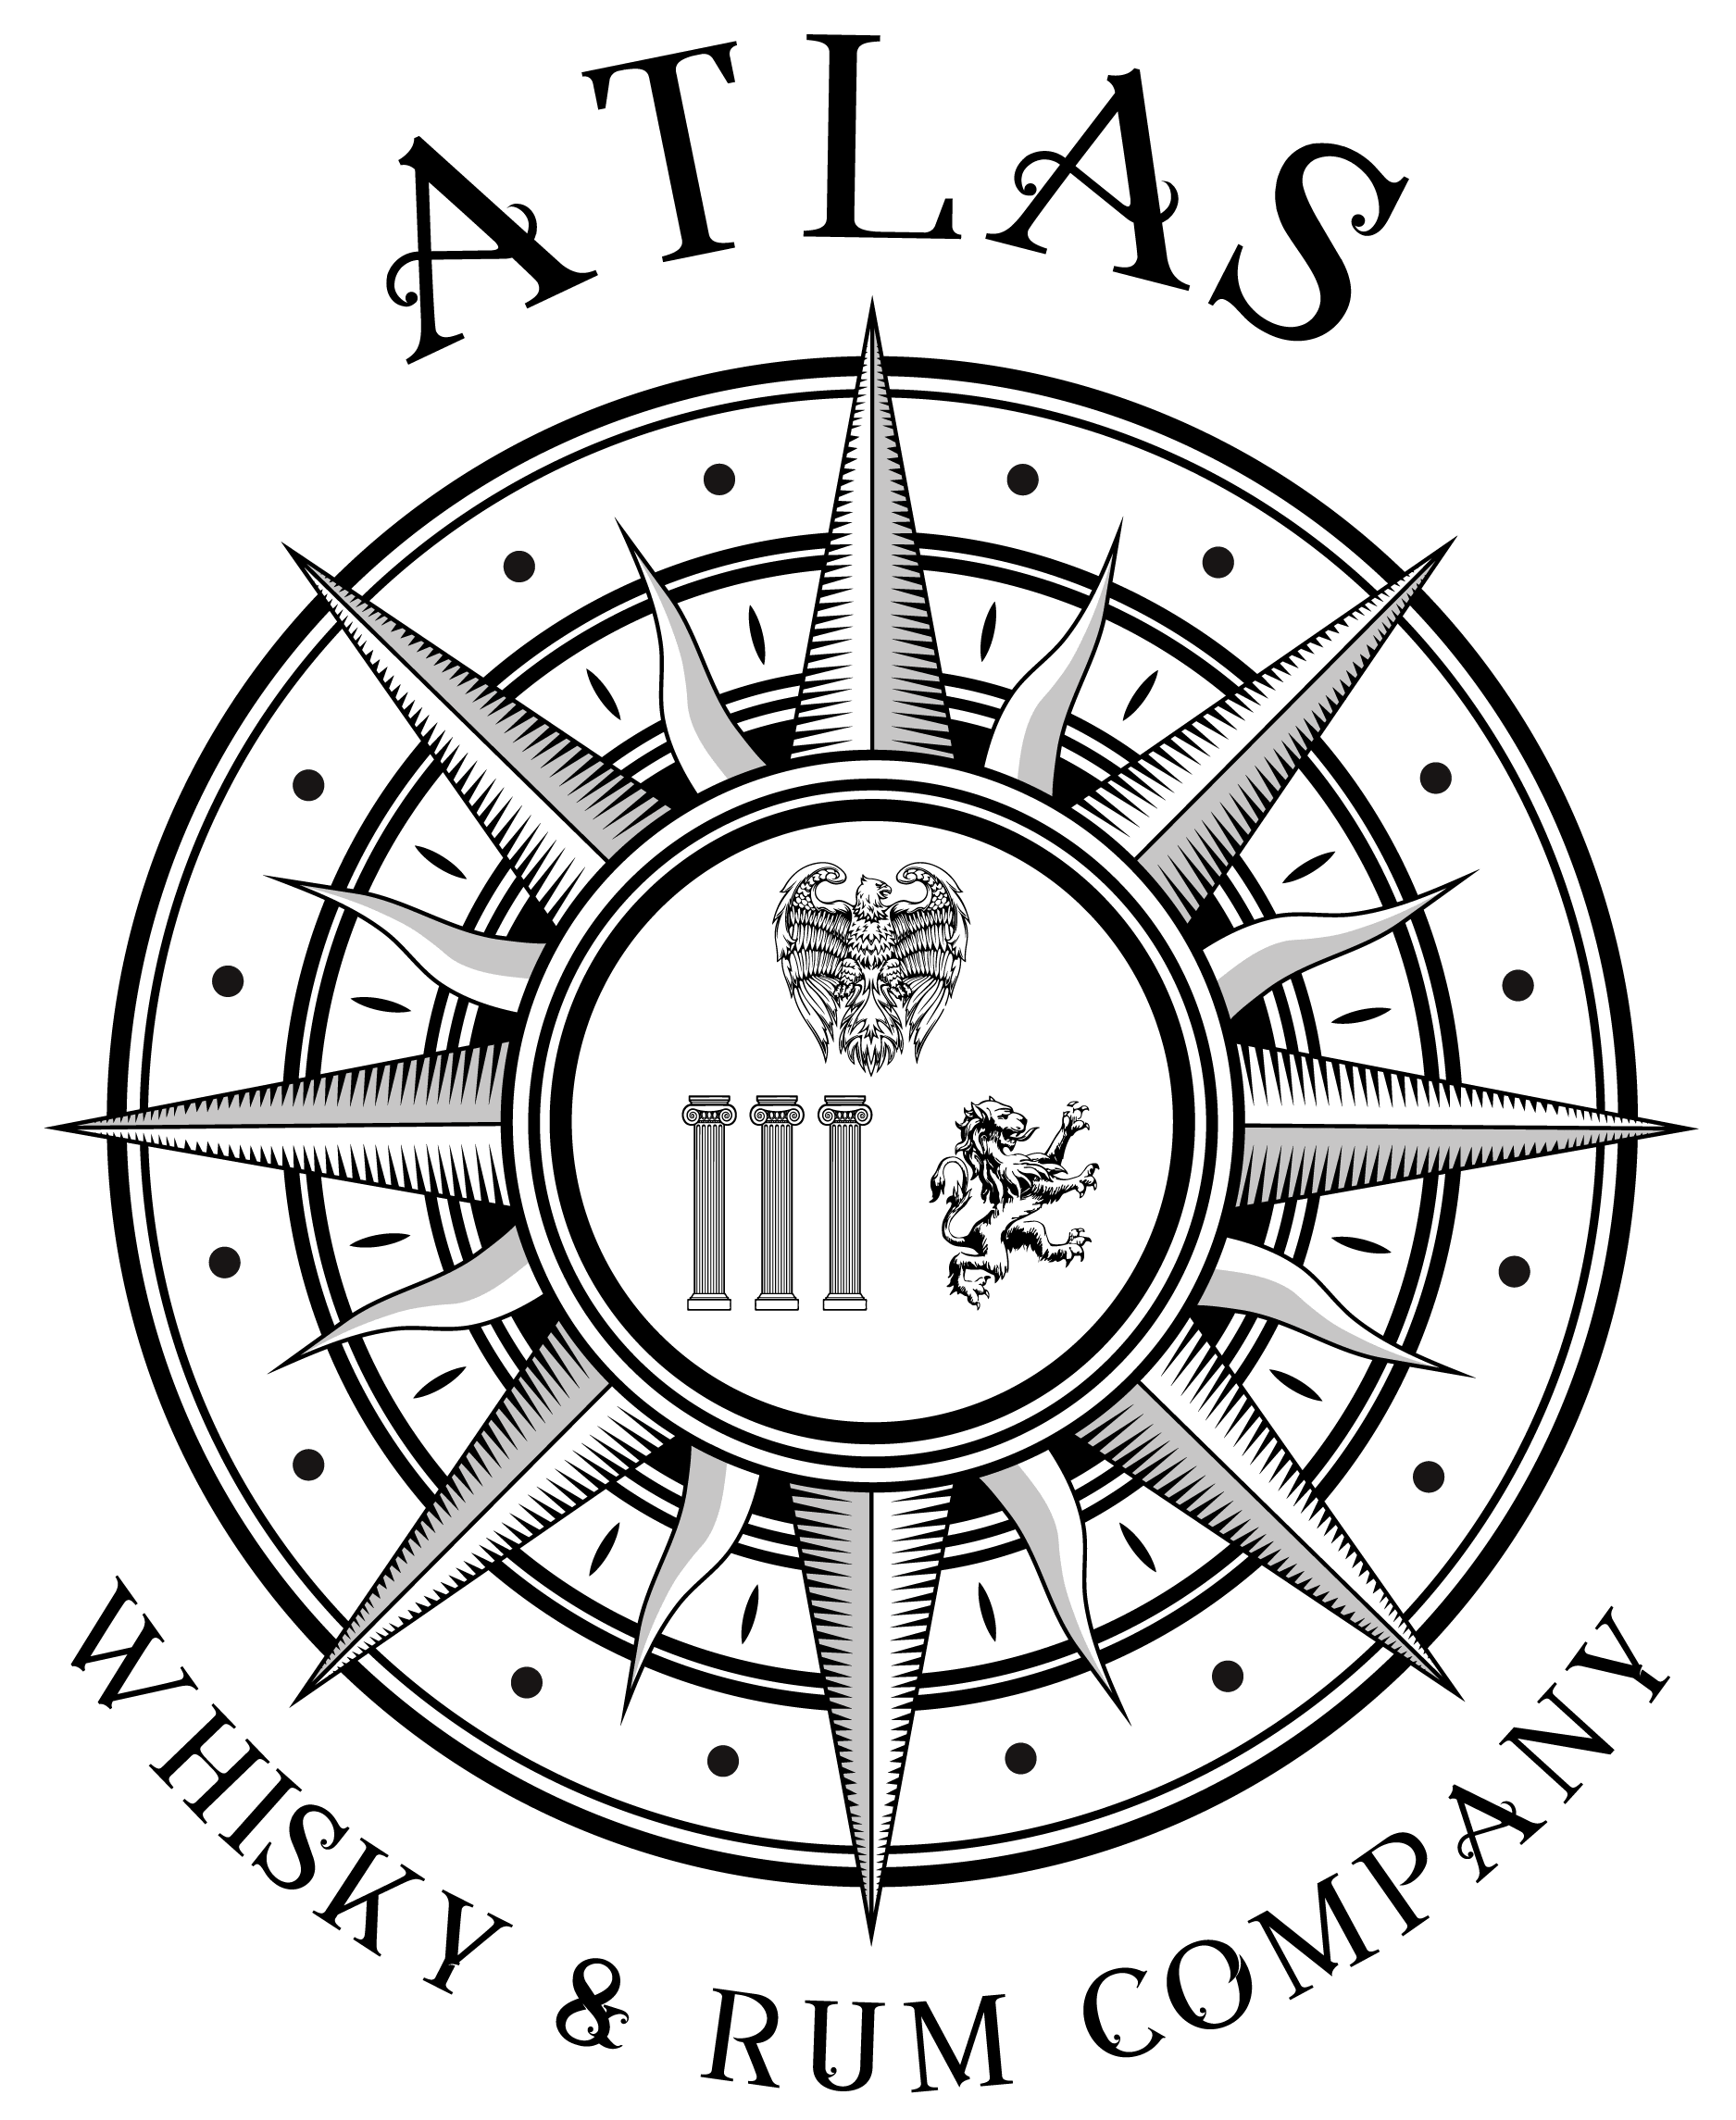 atlas2-min-min